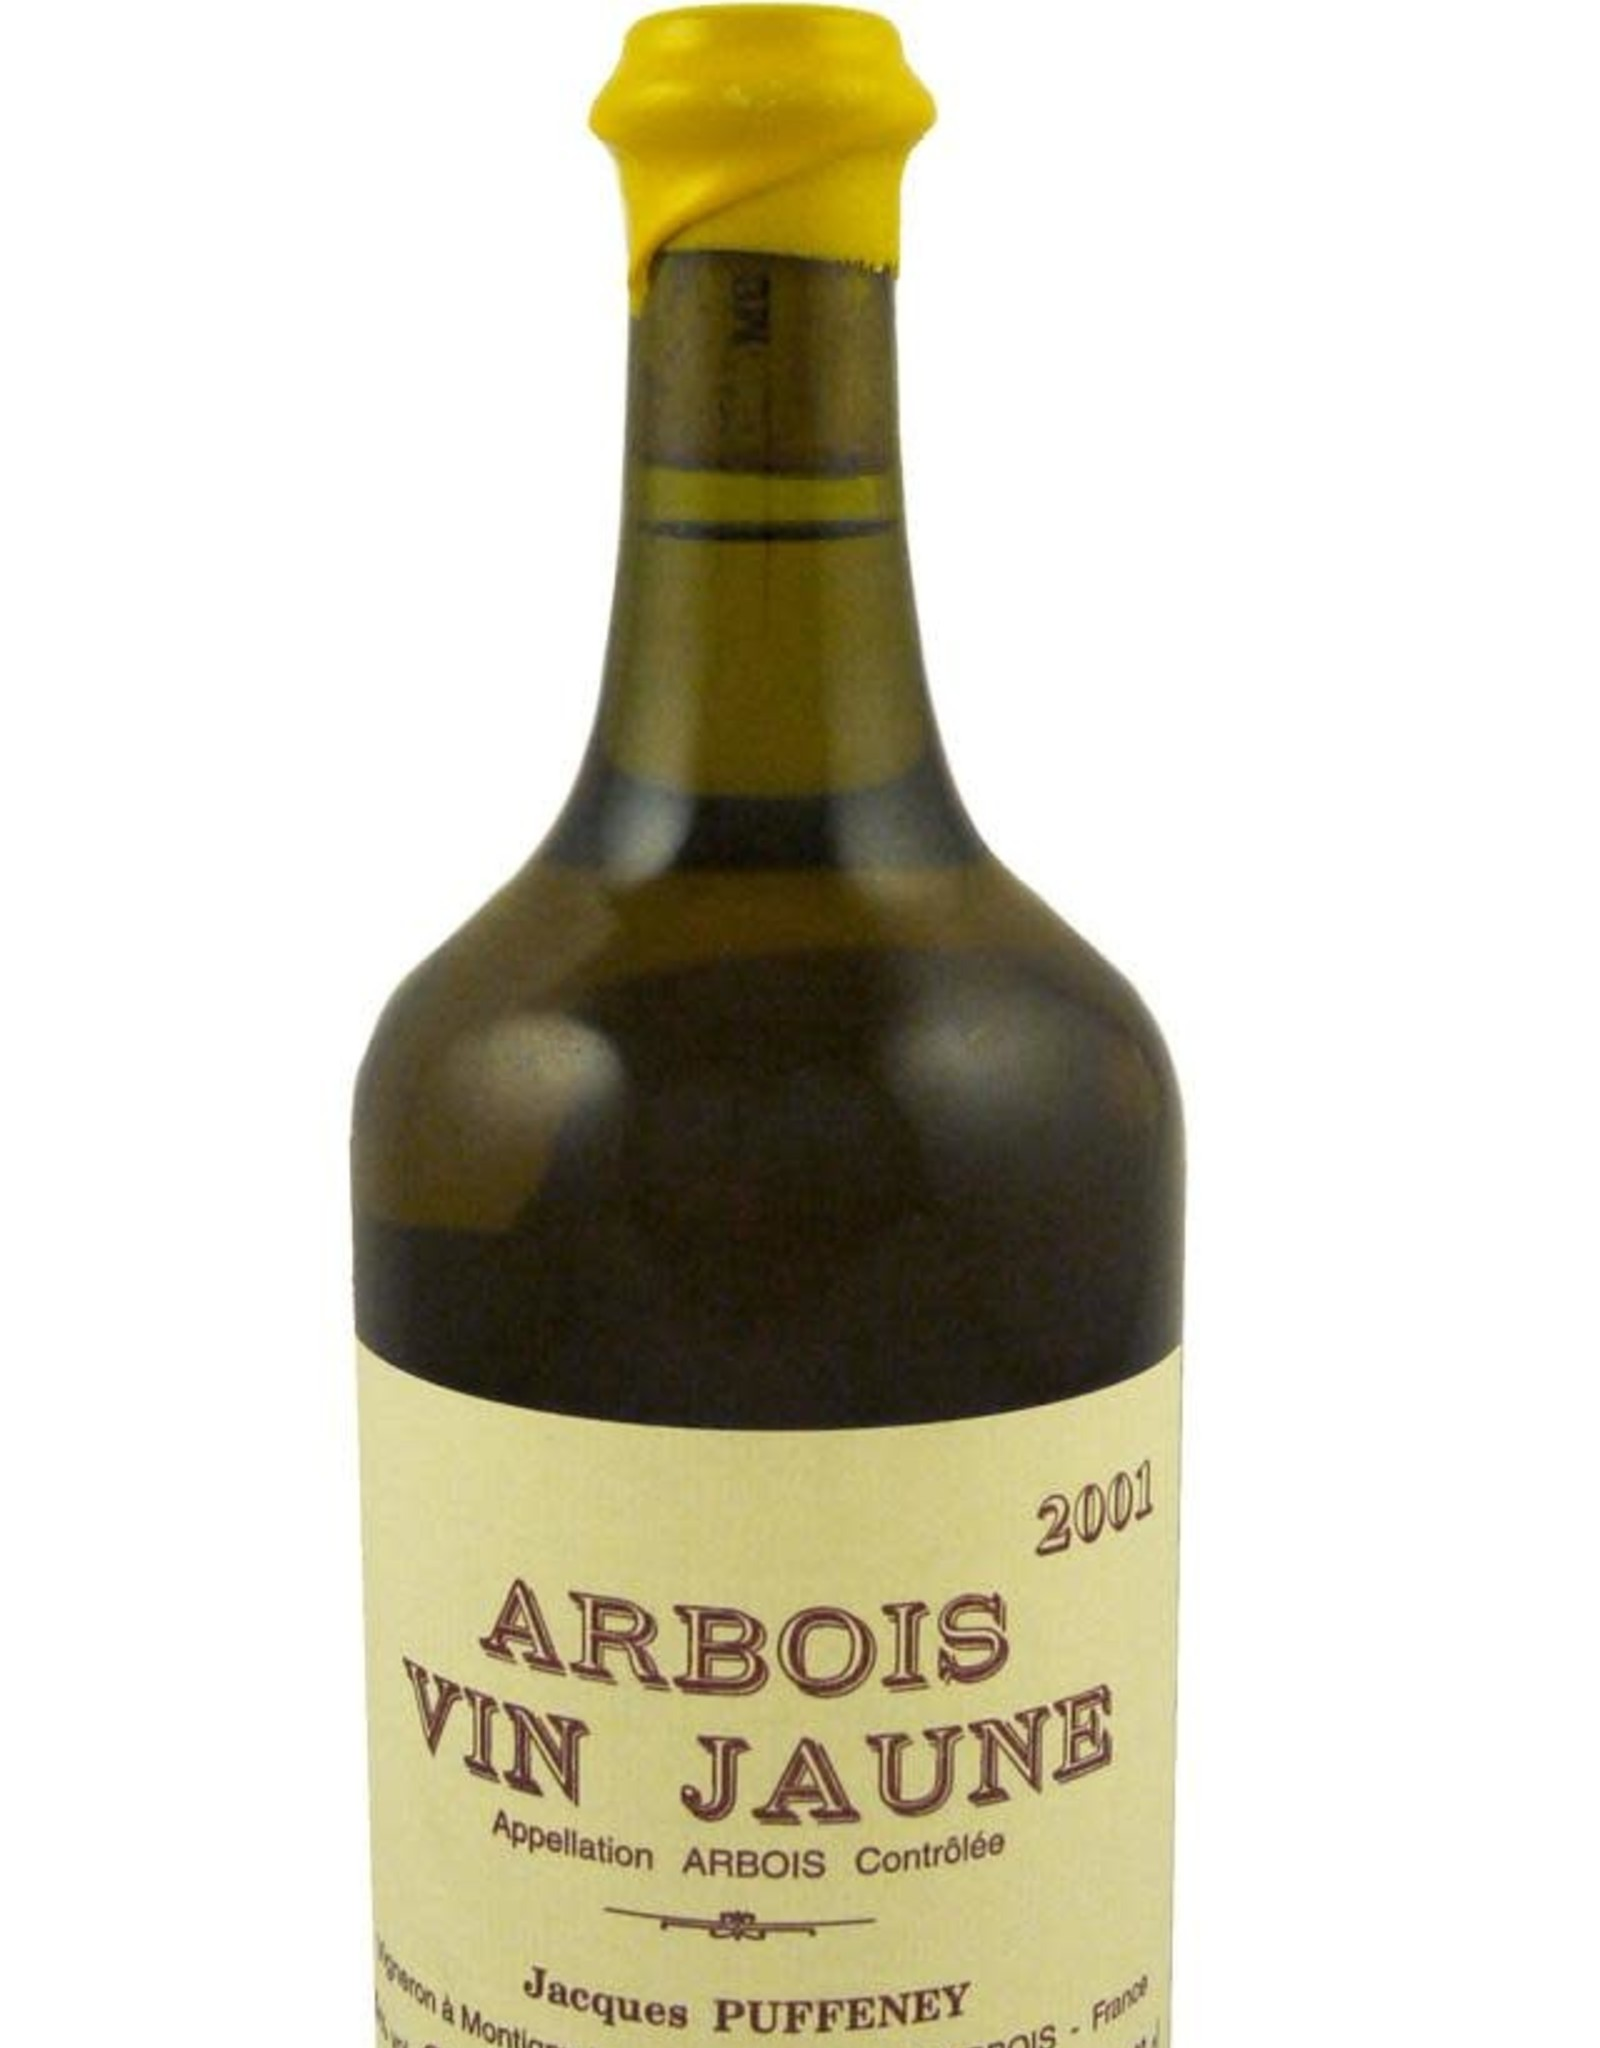 Arbois Vin Jaune, Puffeney 2011 (620 ml)